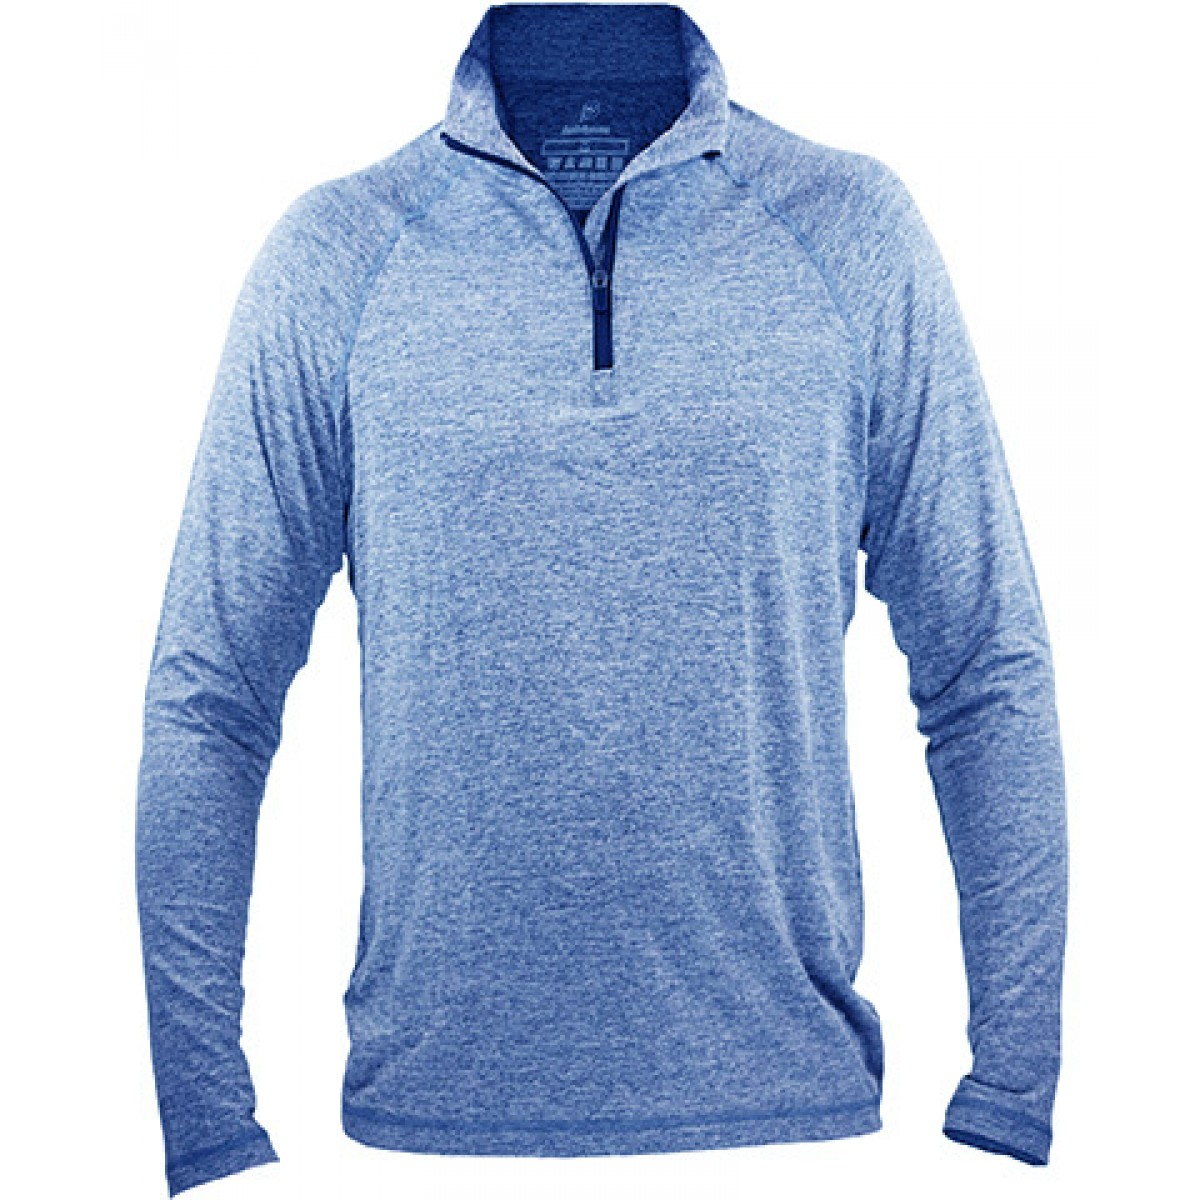 Fine Designs Blend 1/4-Zip Pullover-Blue-2XL